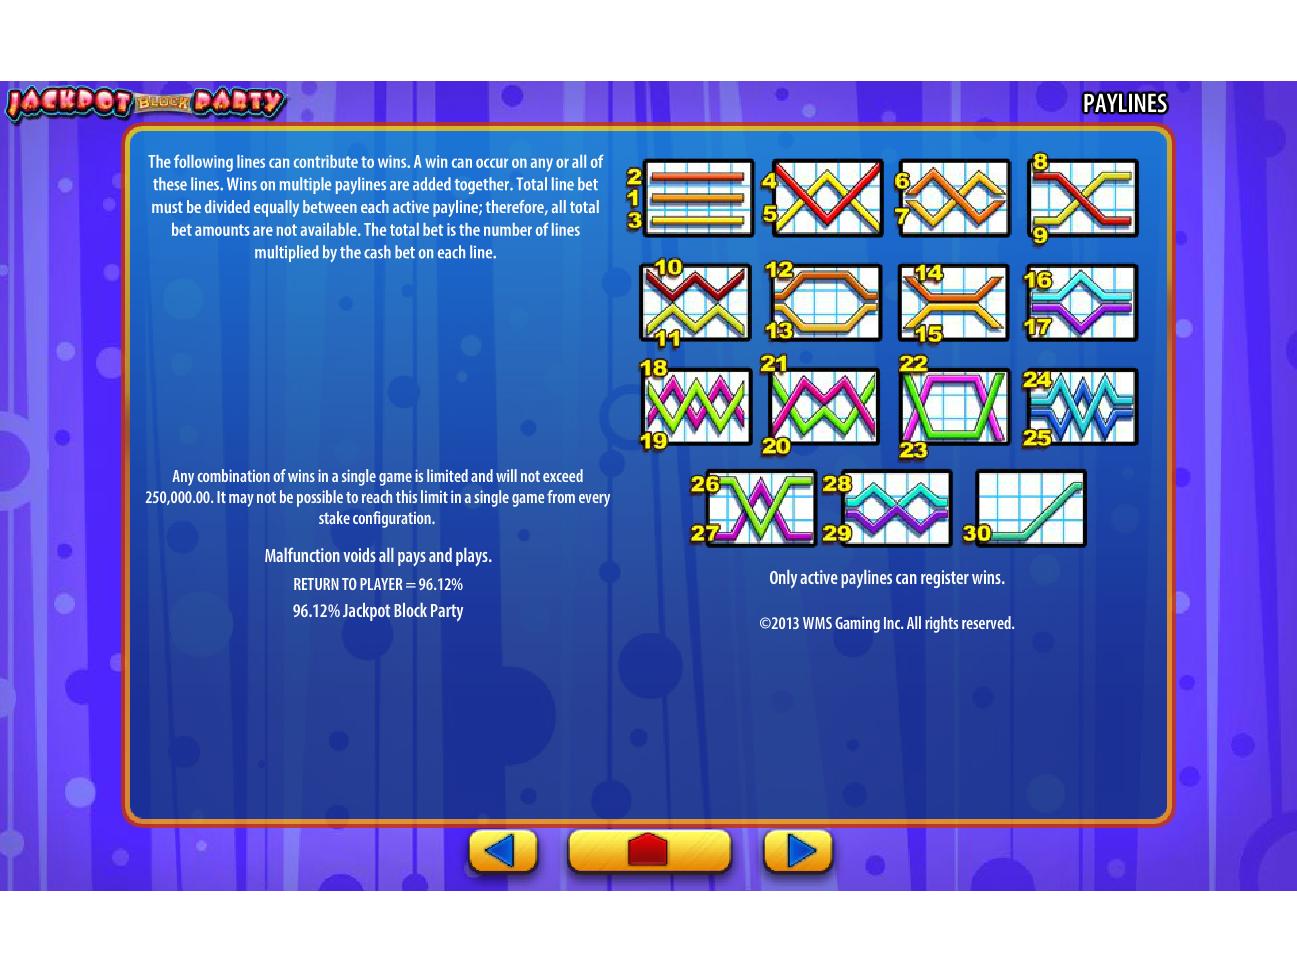 play Jackpot Block Party online